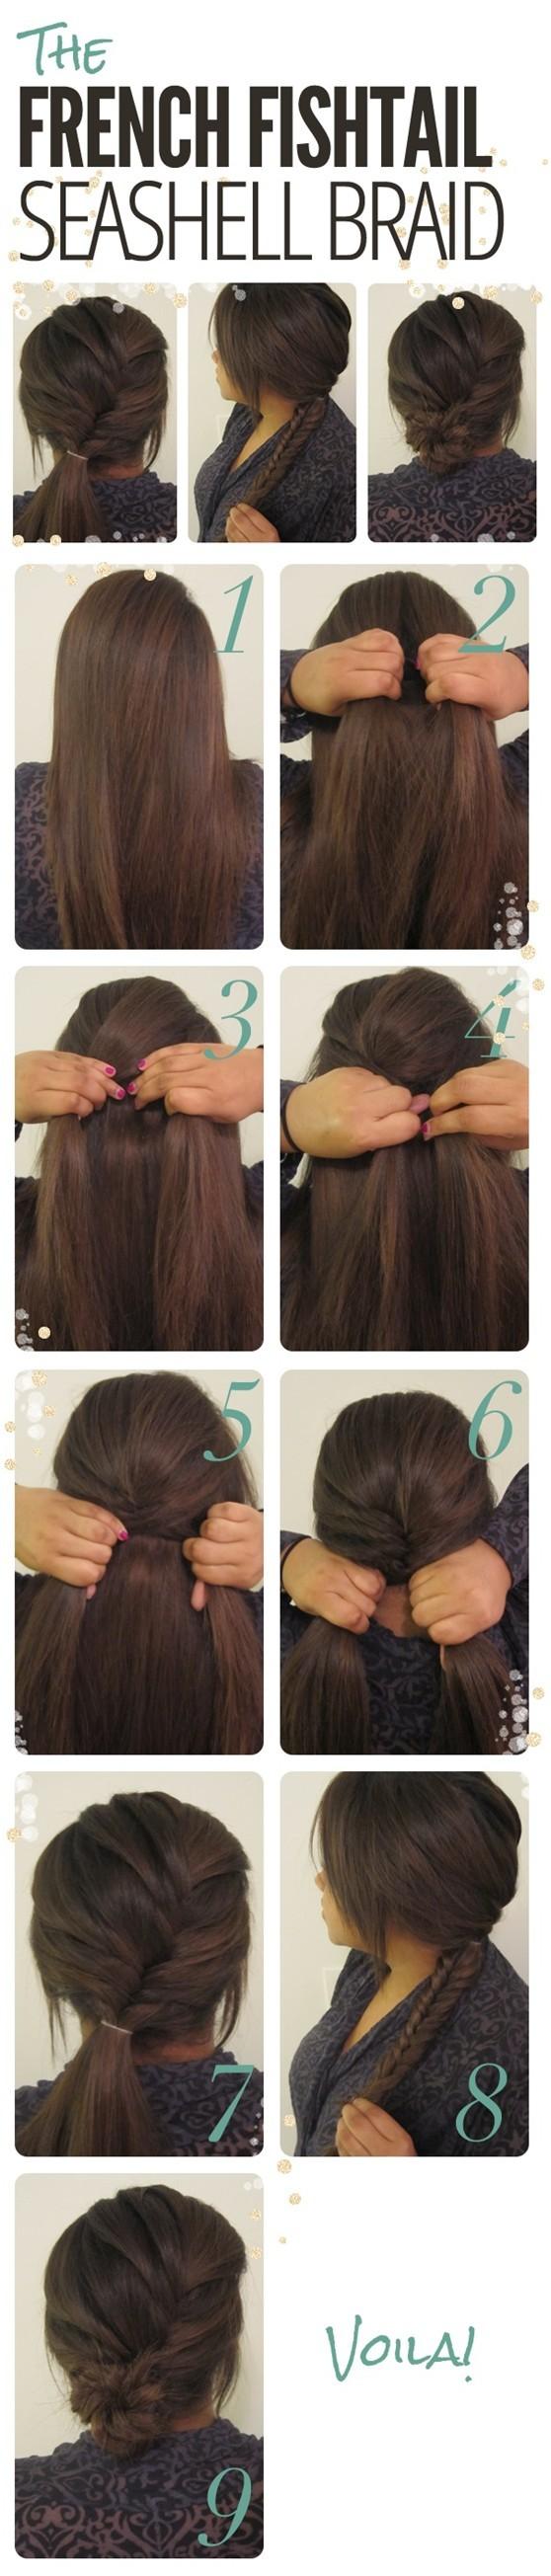 Phenomenal 15 Braided Updo Hairstyles Tutorials Pretty Designs Hairstyles For Men Maxibearus